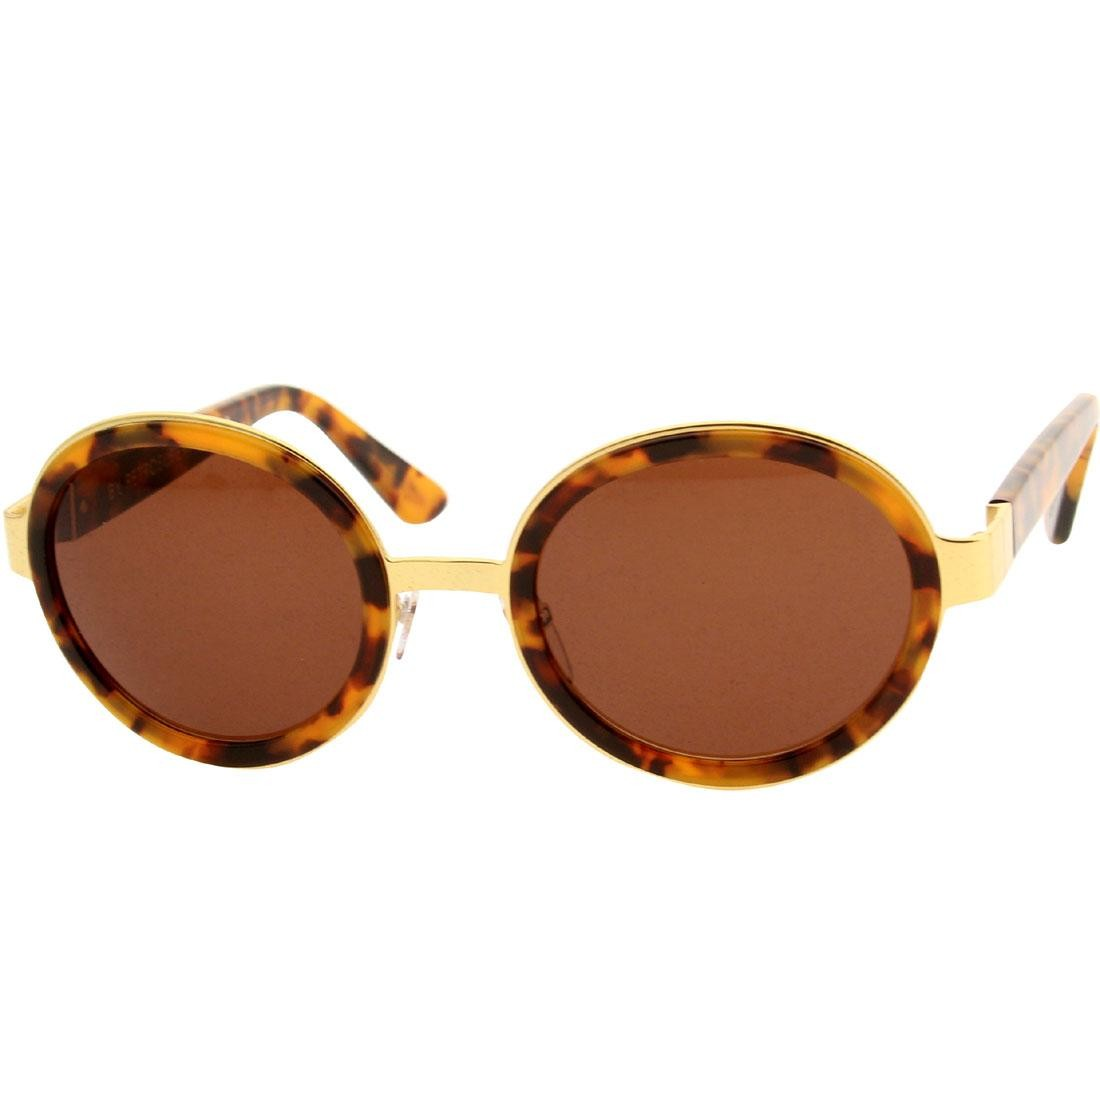 Super Sunglasses Santa - Spotted (brown)